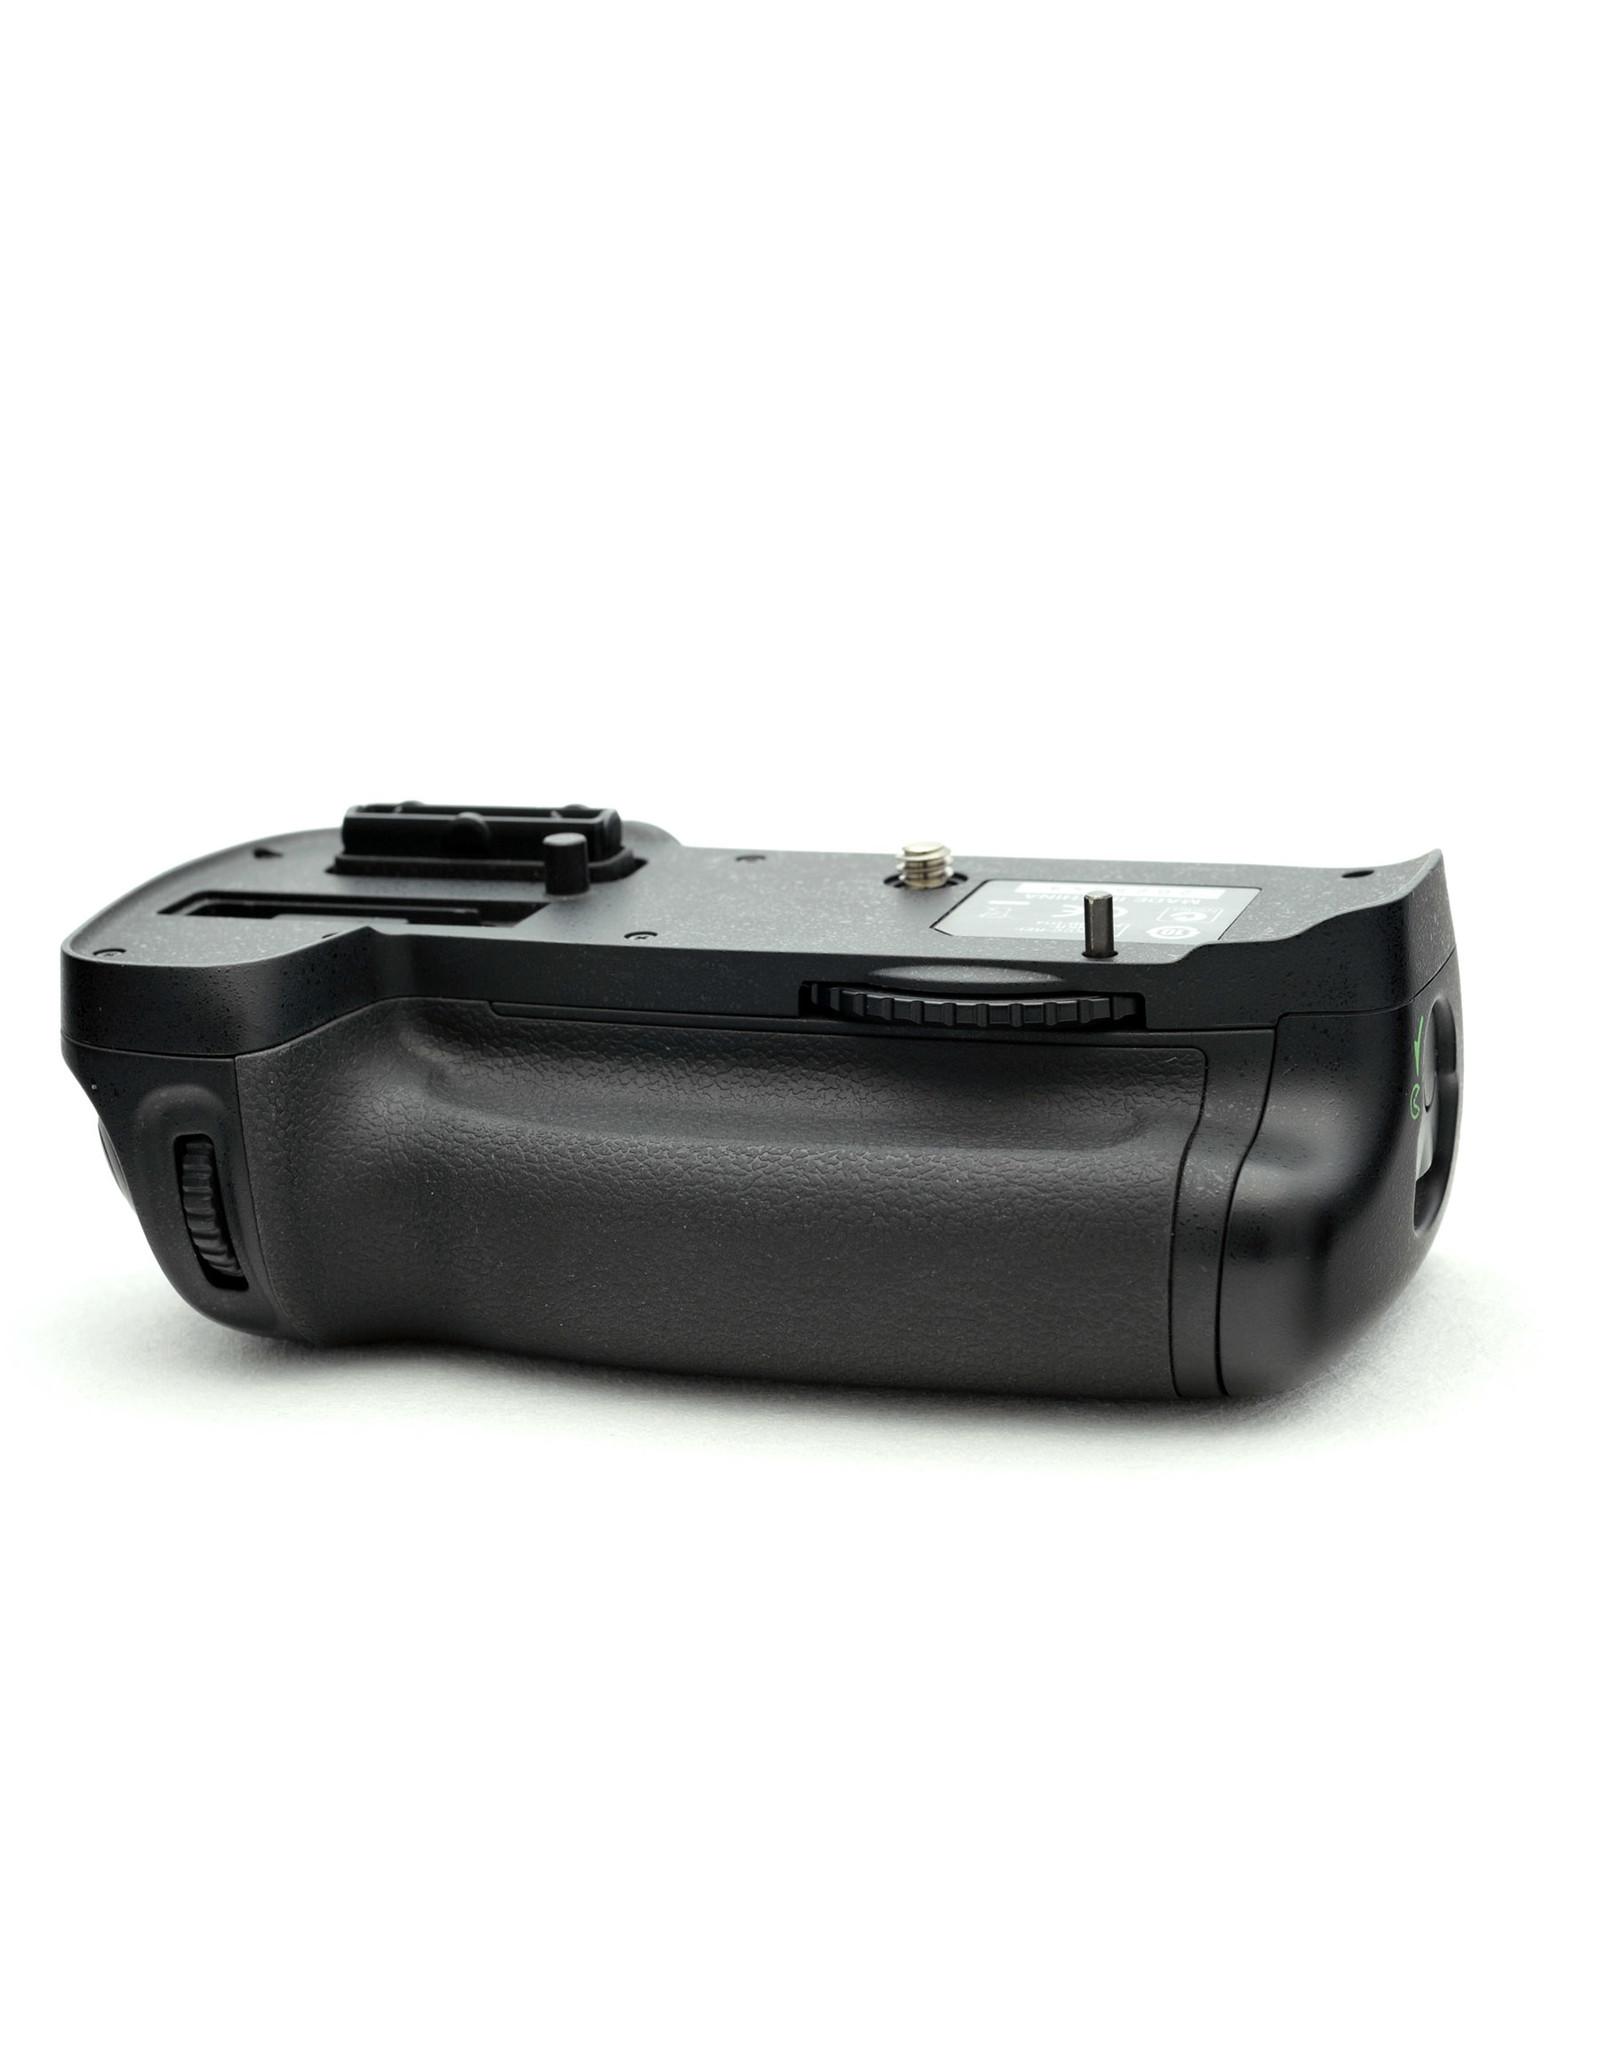 Nikon Nikon MB-D14 Vertical Battery Grip (D600/D610)   AP1020406